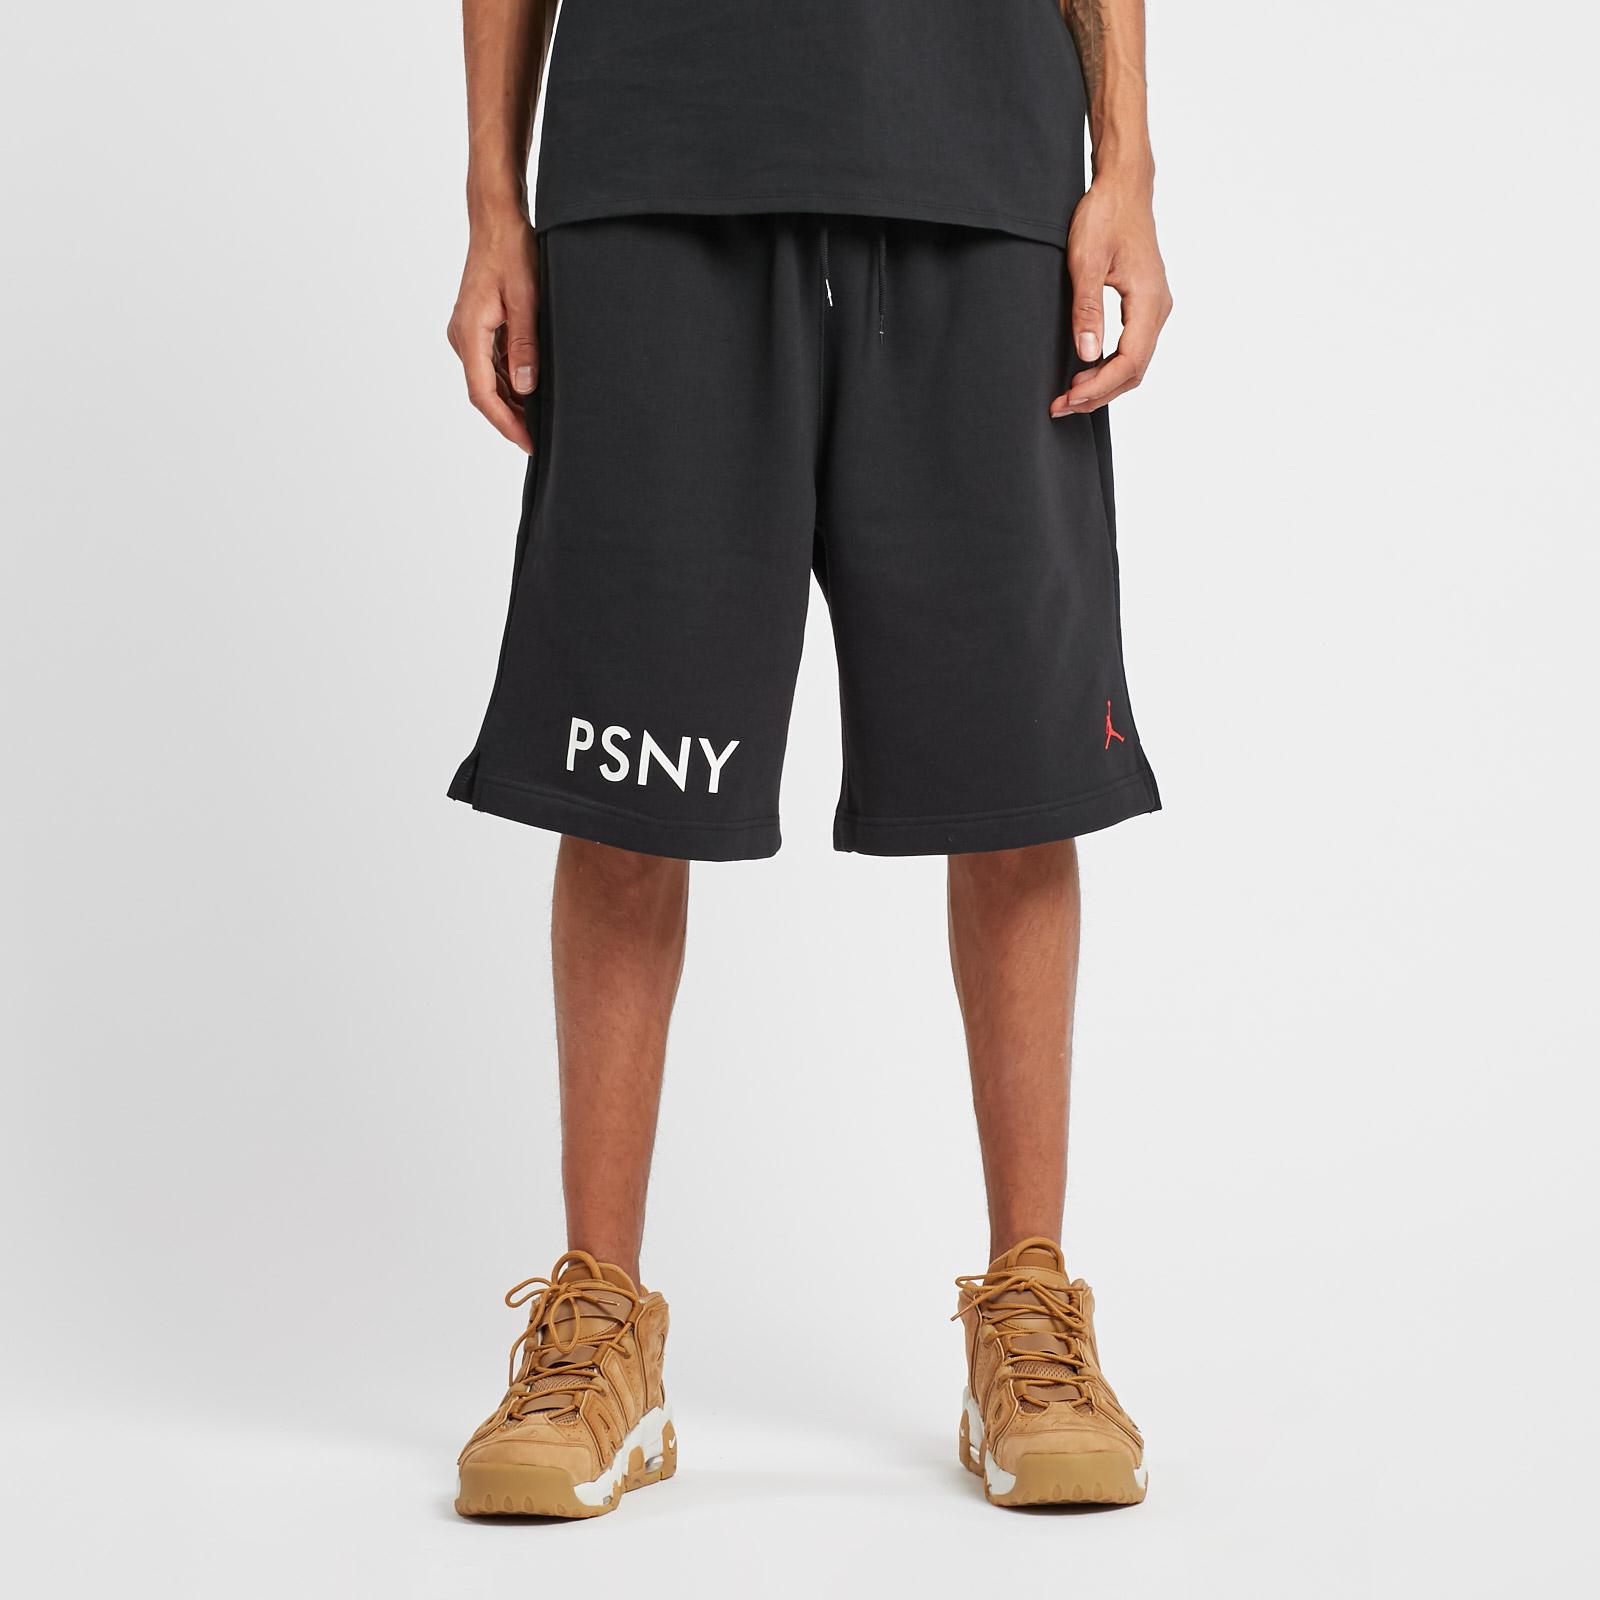 379413c3761c49 Jordan Brand PSNY x Jordan Short - Aa8898-010 - Sneakersnstuff ...